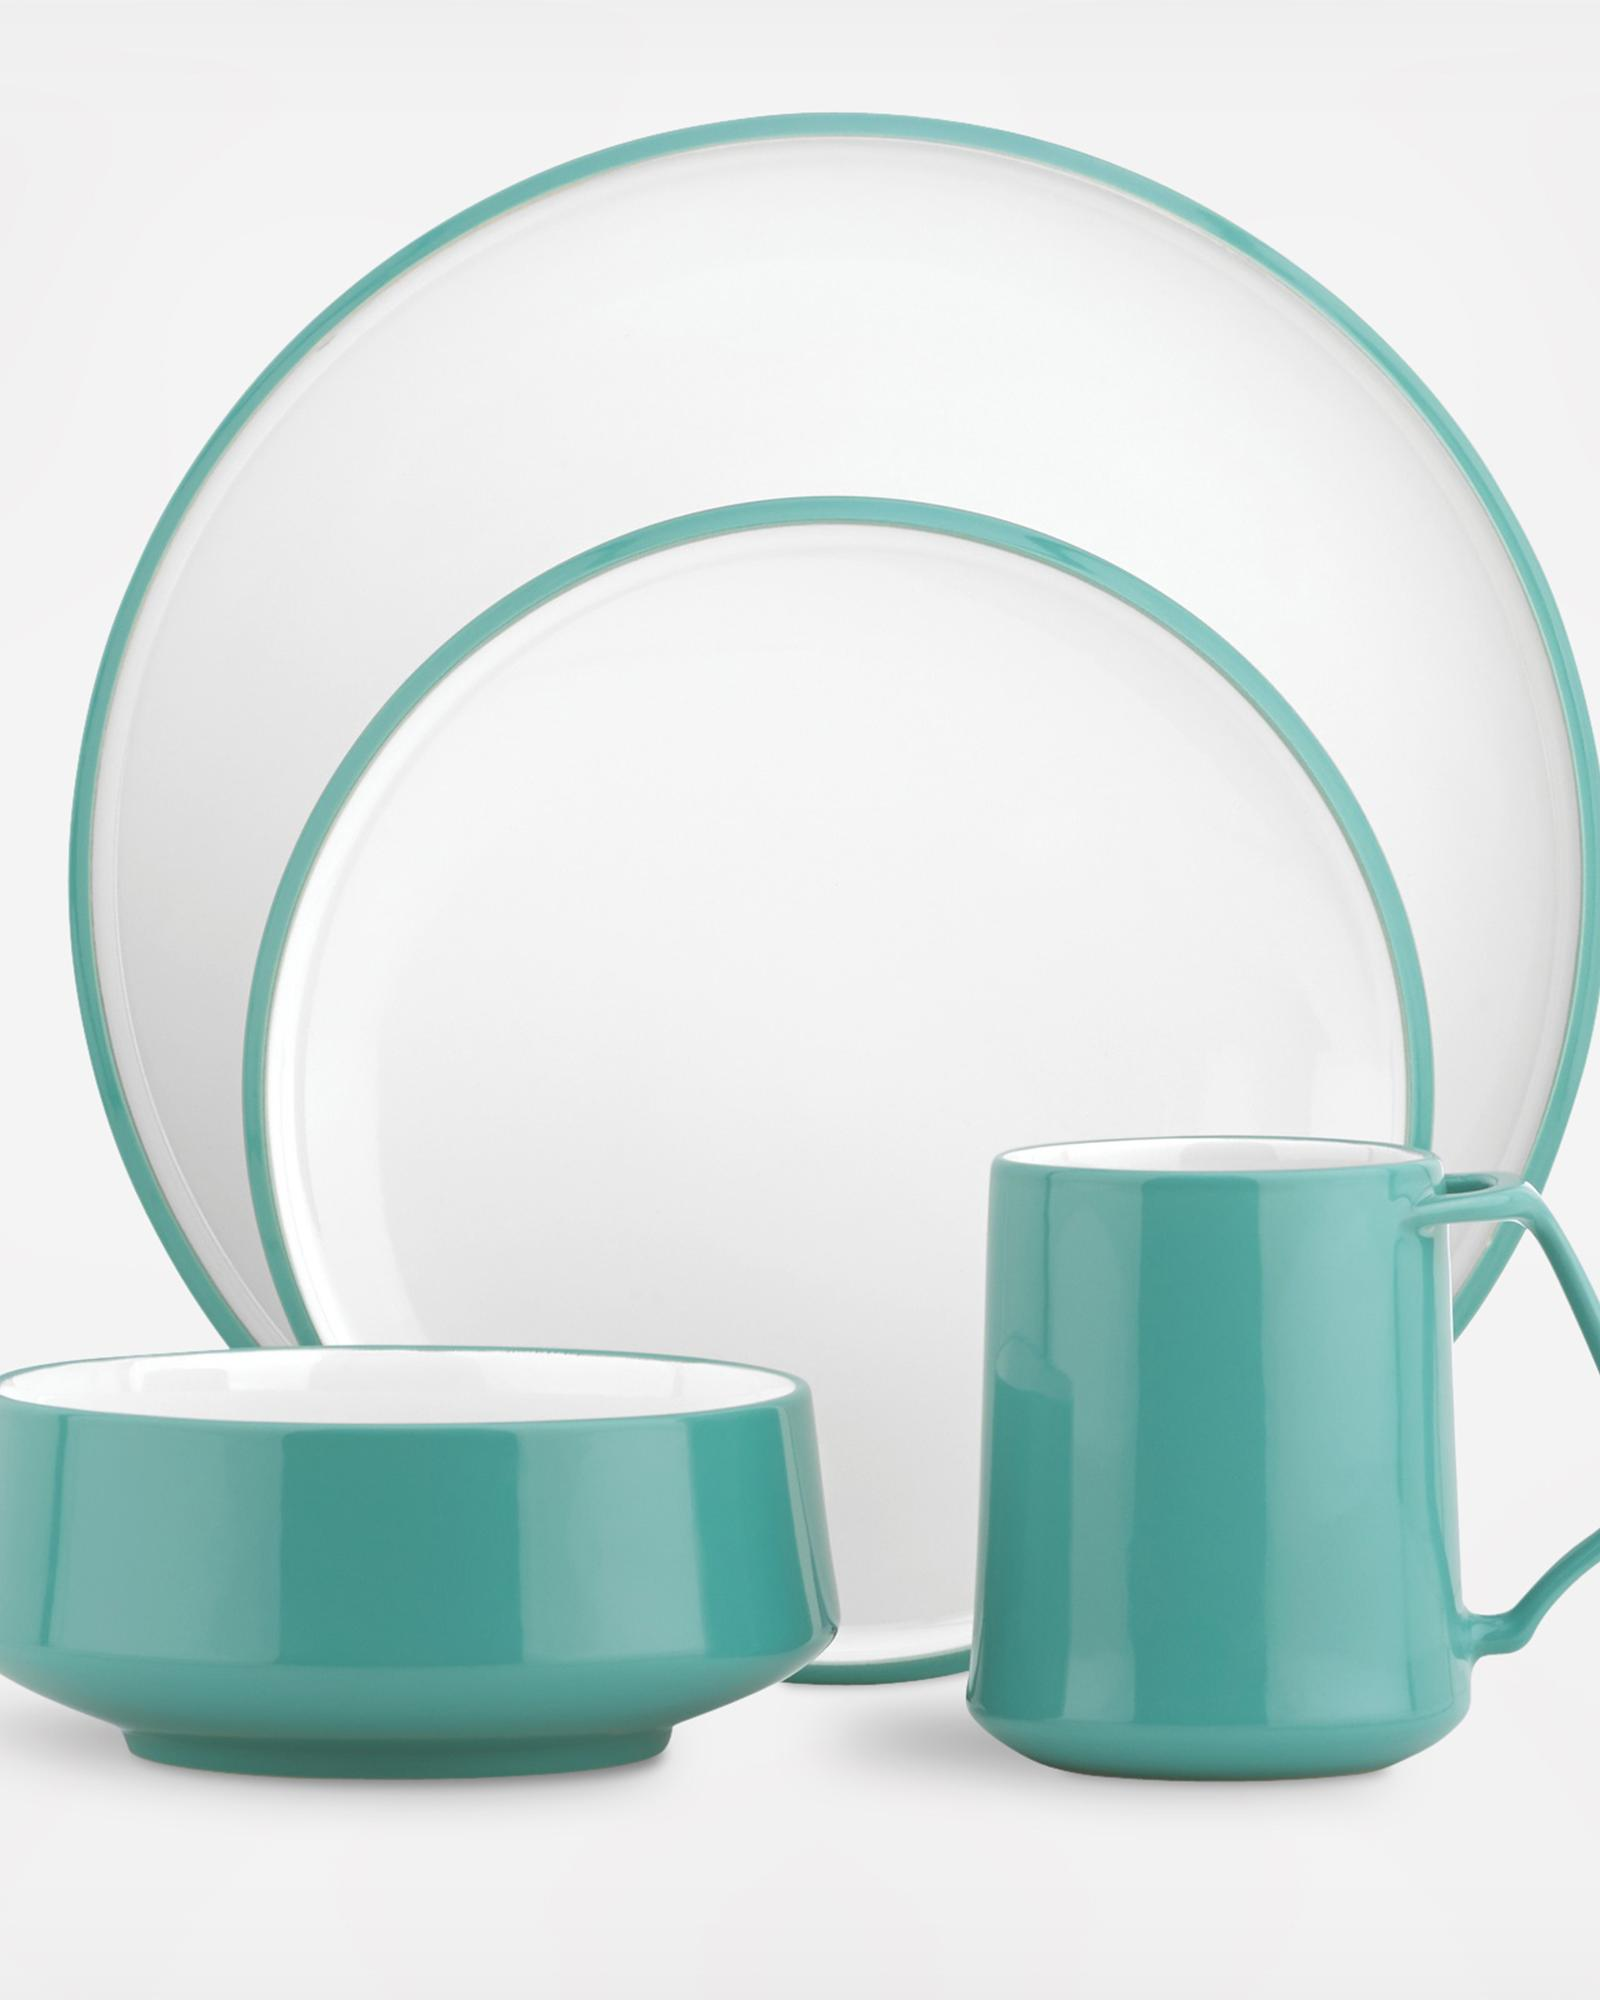 registry-gifts-budget-zola-dansk-4pcsetting-0615